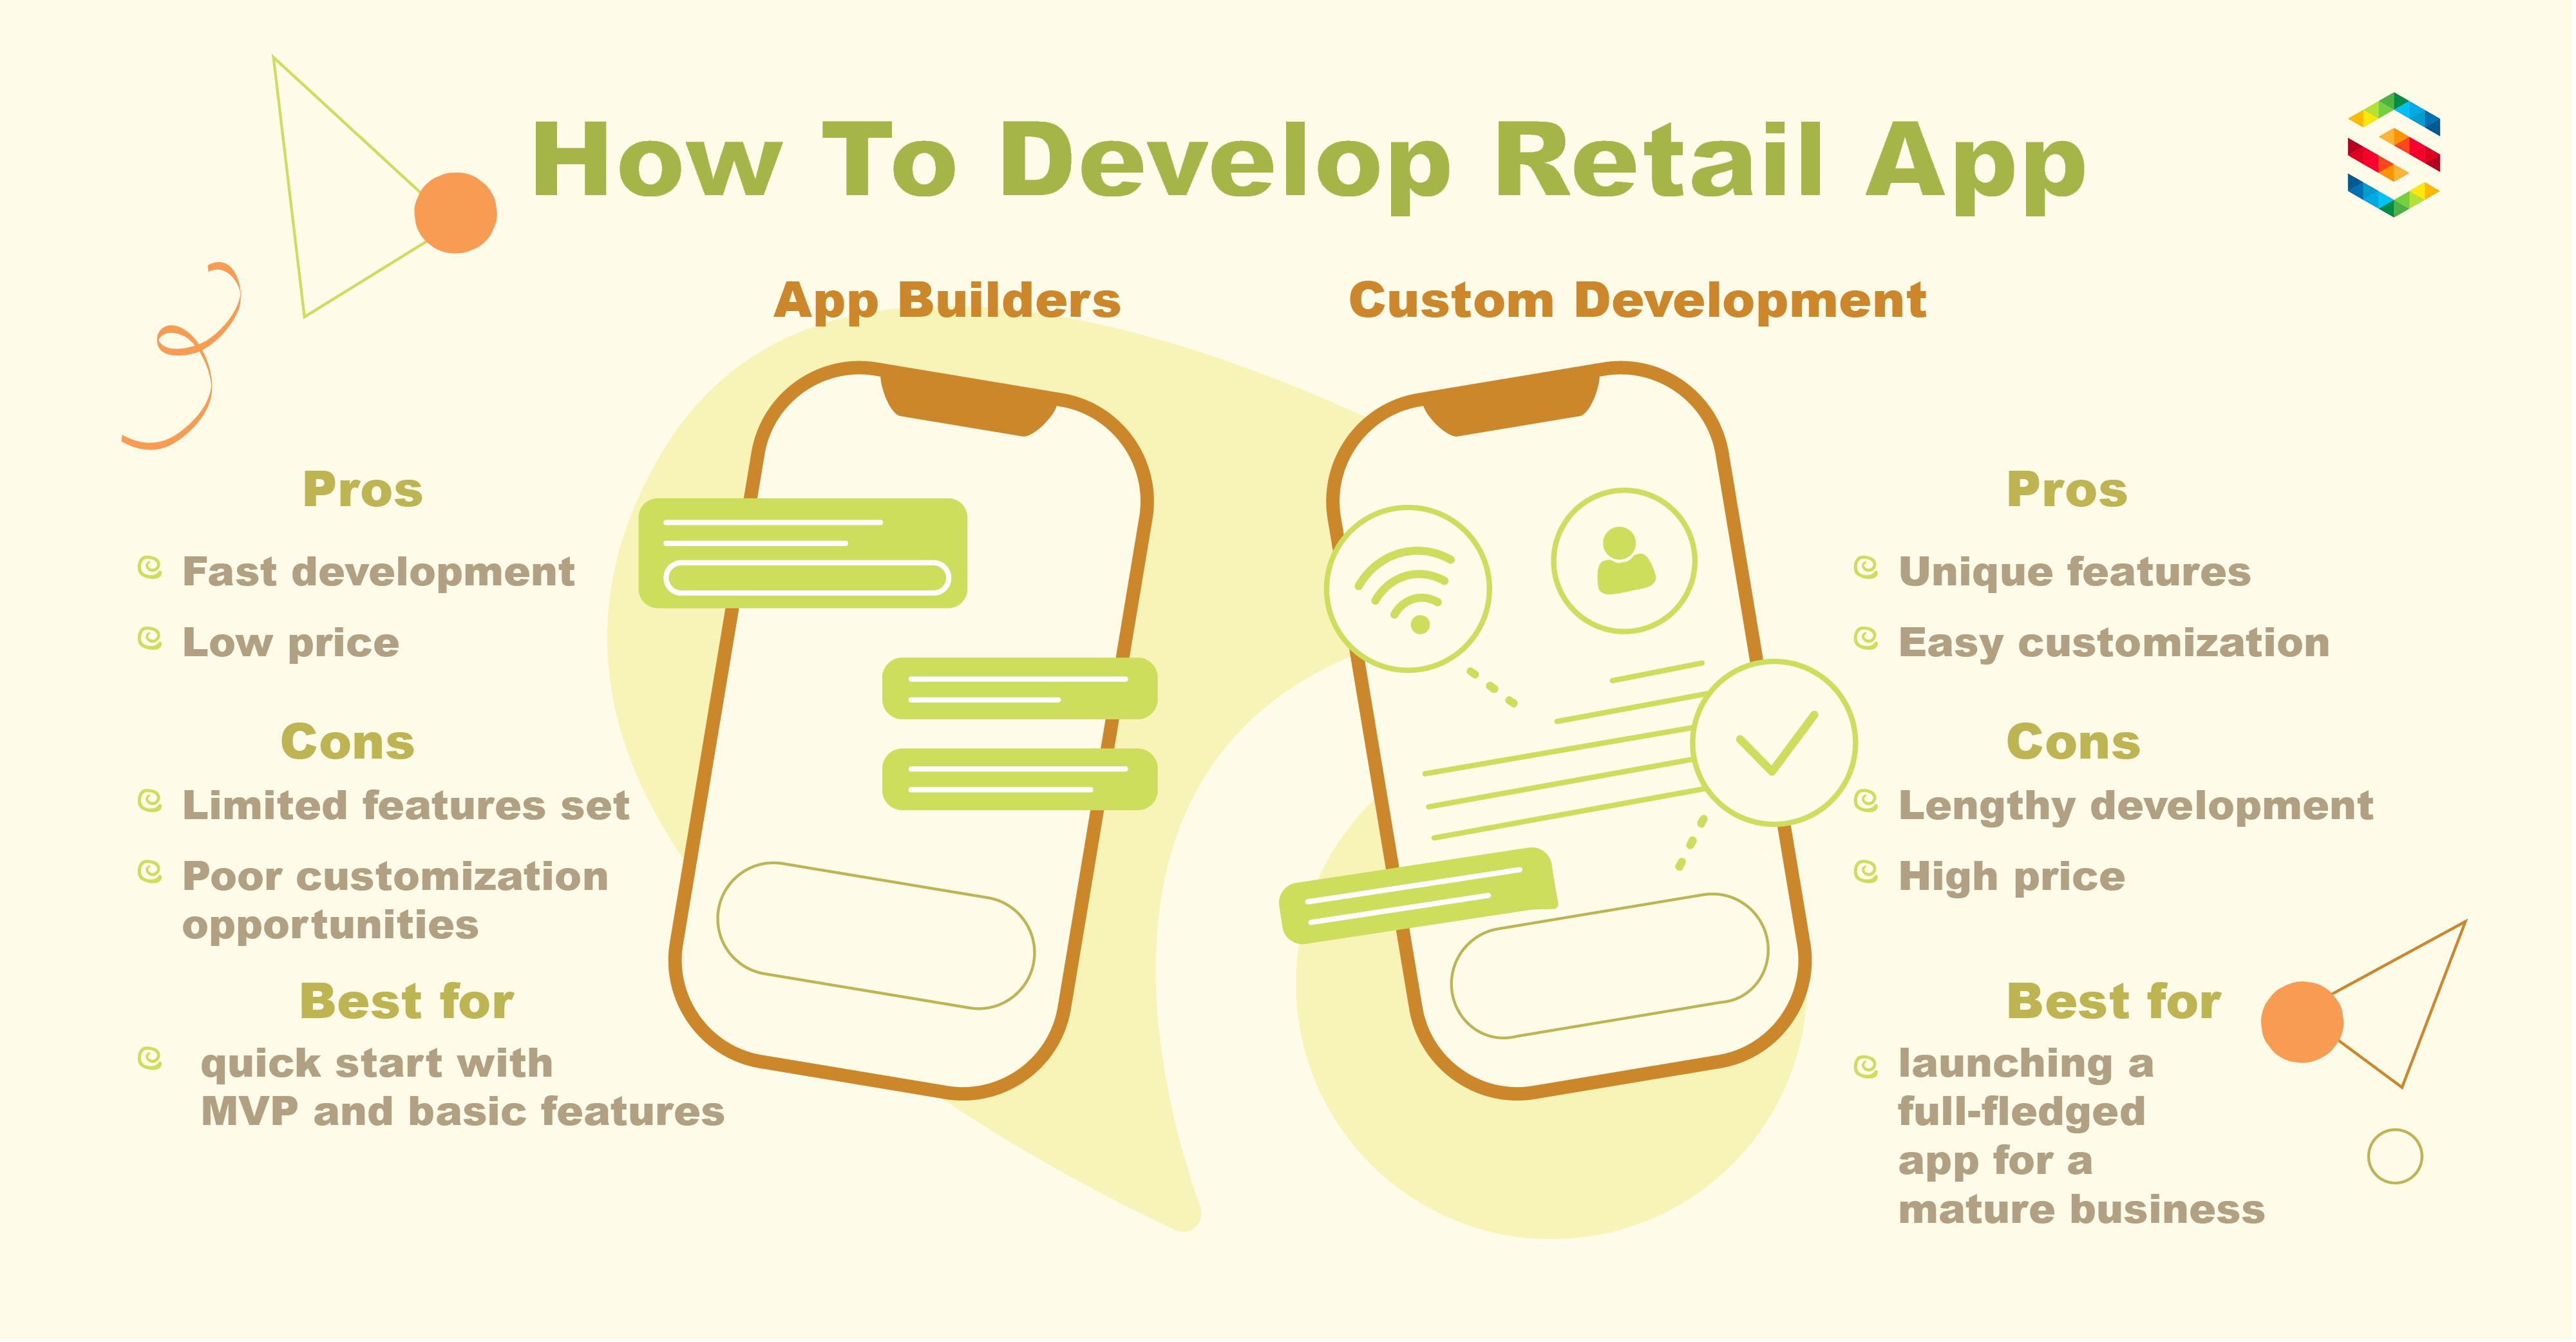 Two ways to make retail app